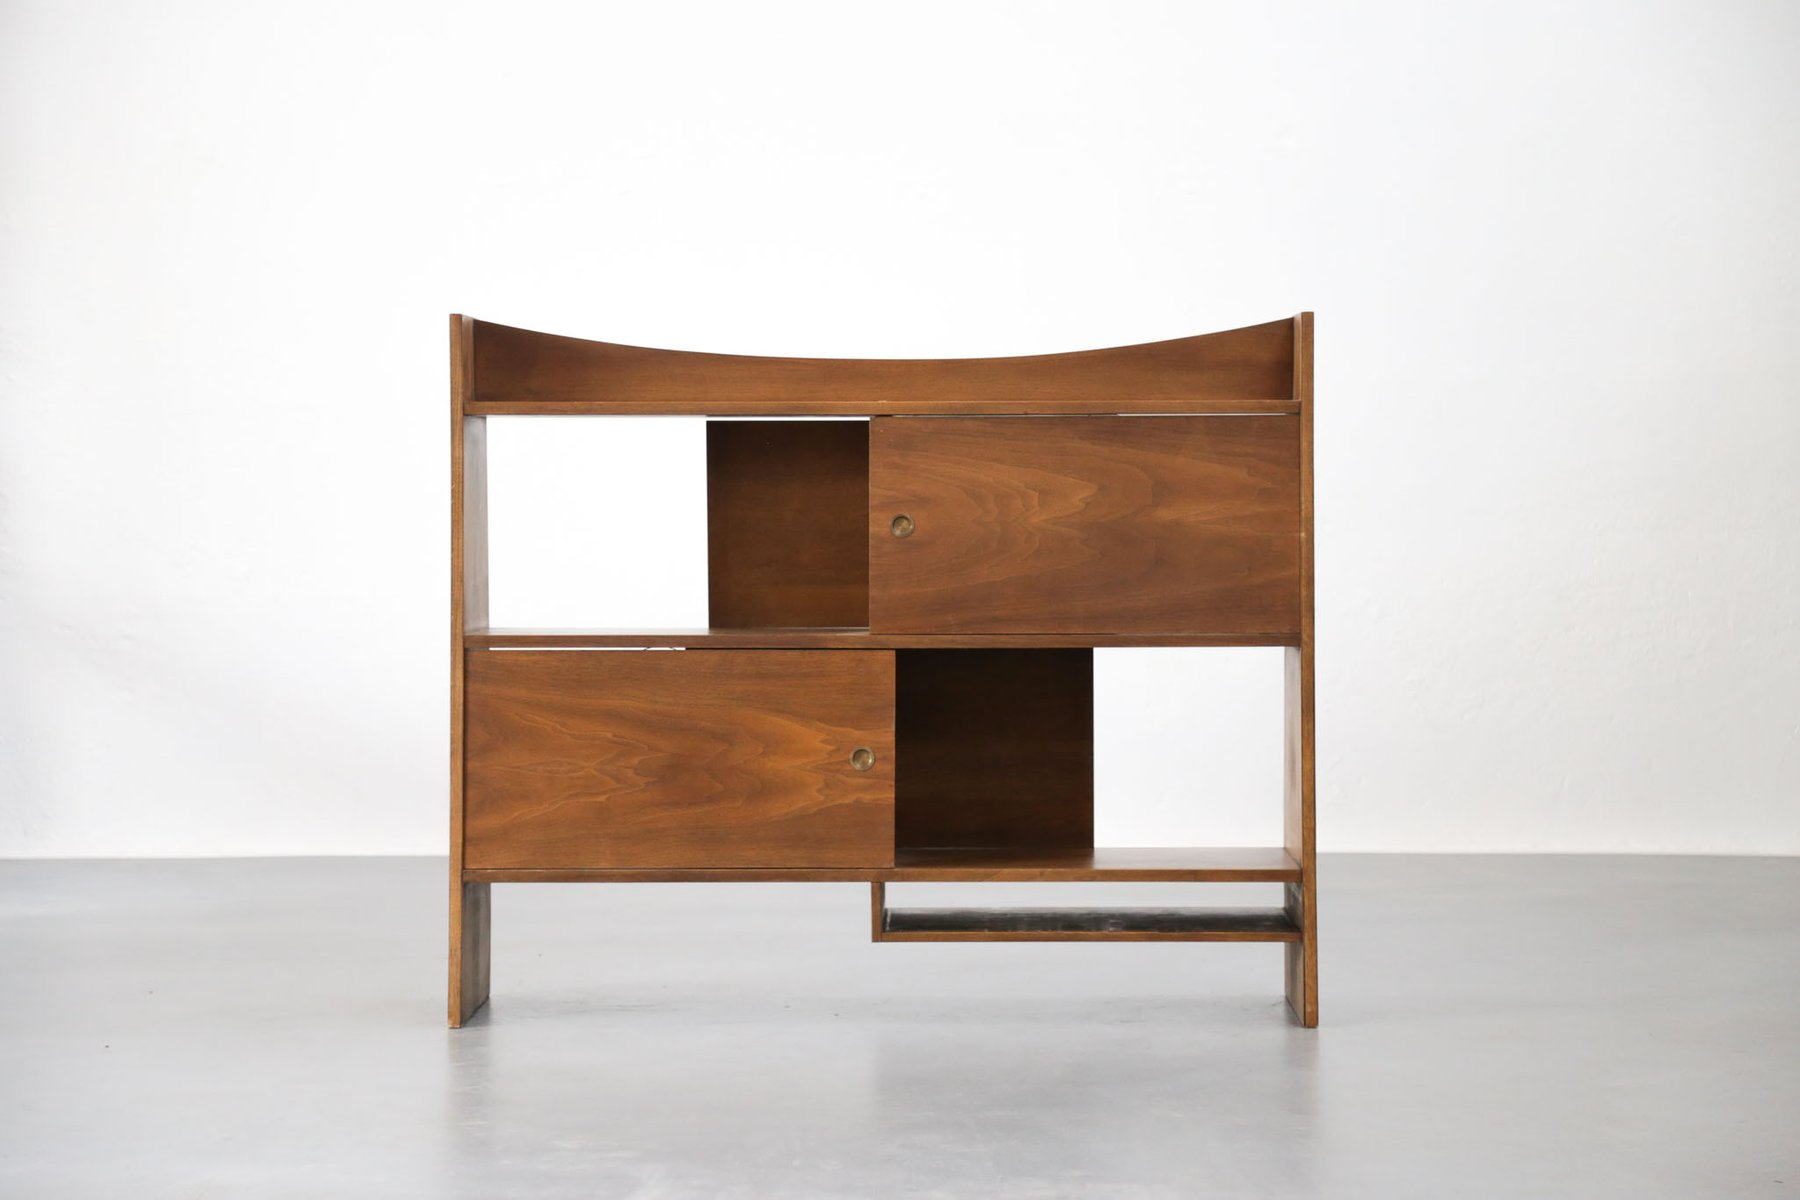 biblioth que modulaire france 1950s en vente sur pamono. Black Bedroom Furniture Sets. Home Design Ideas